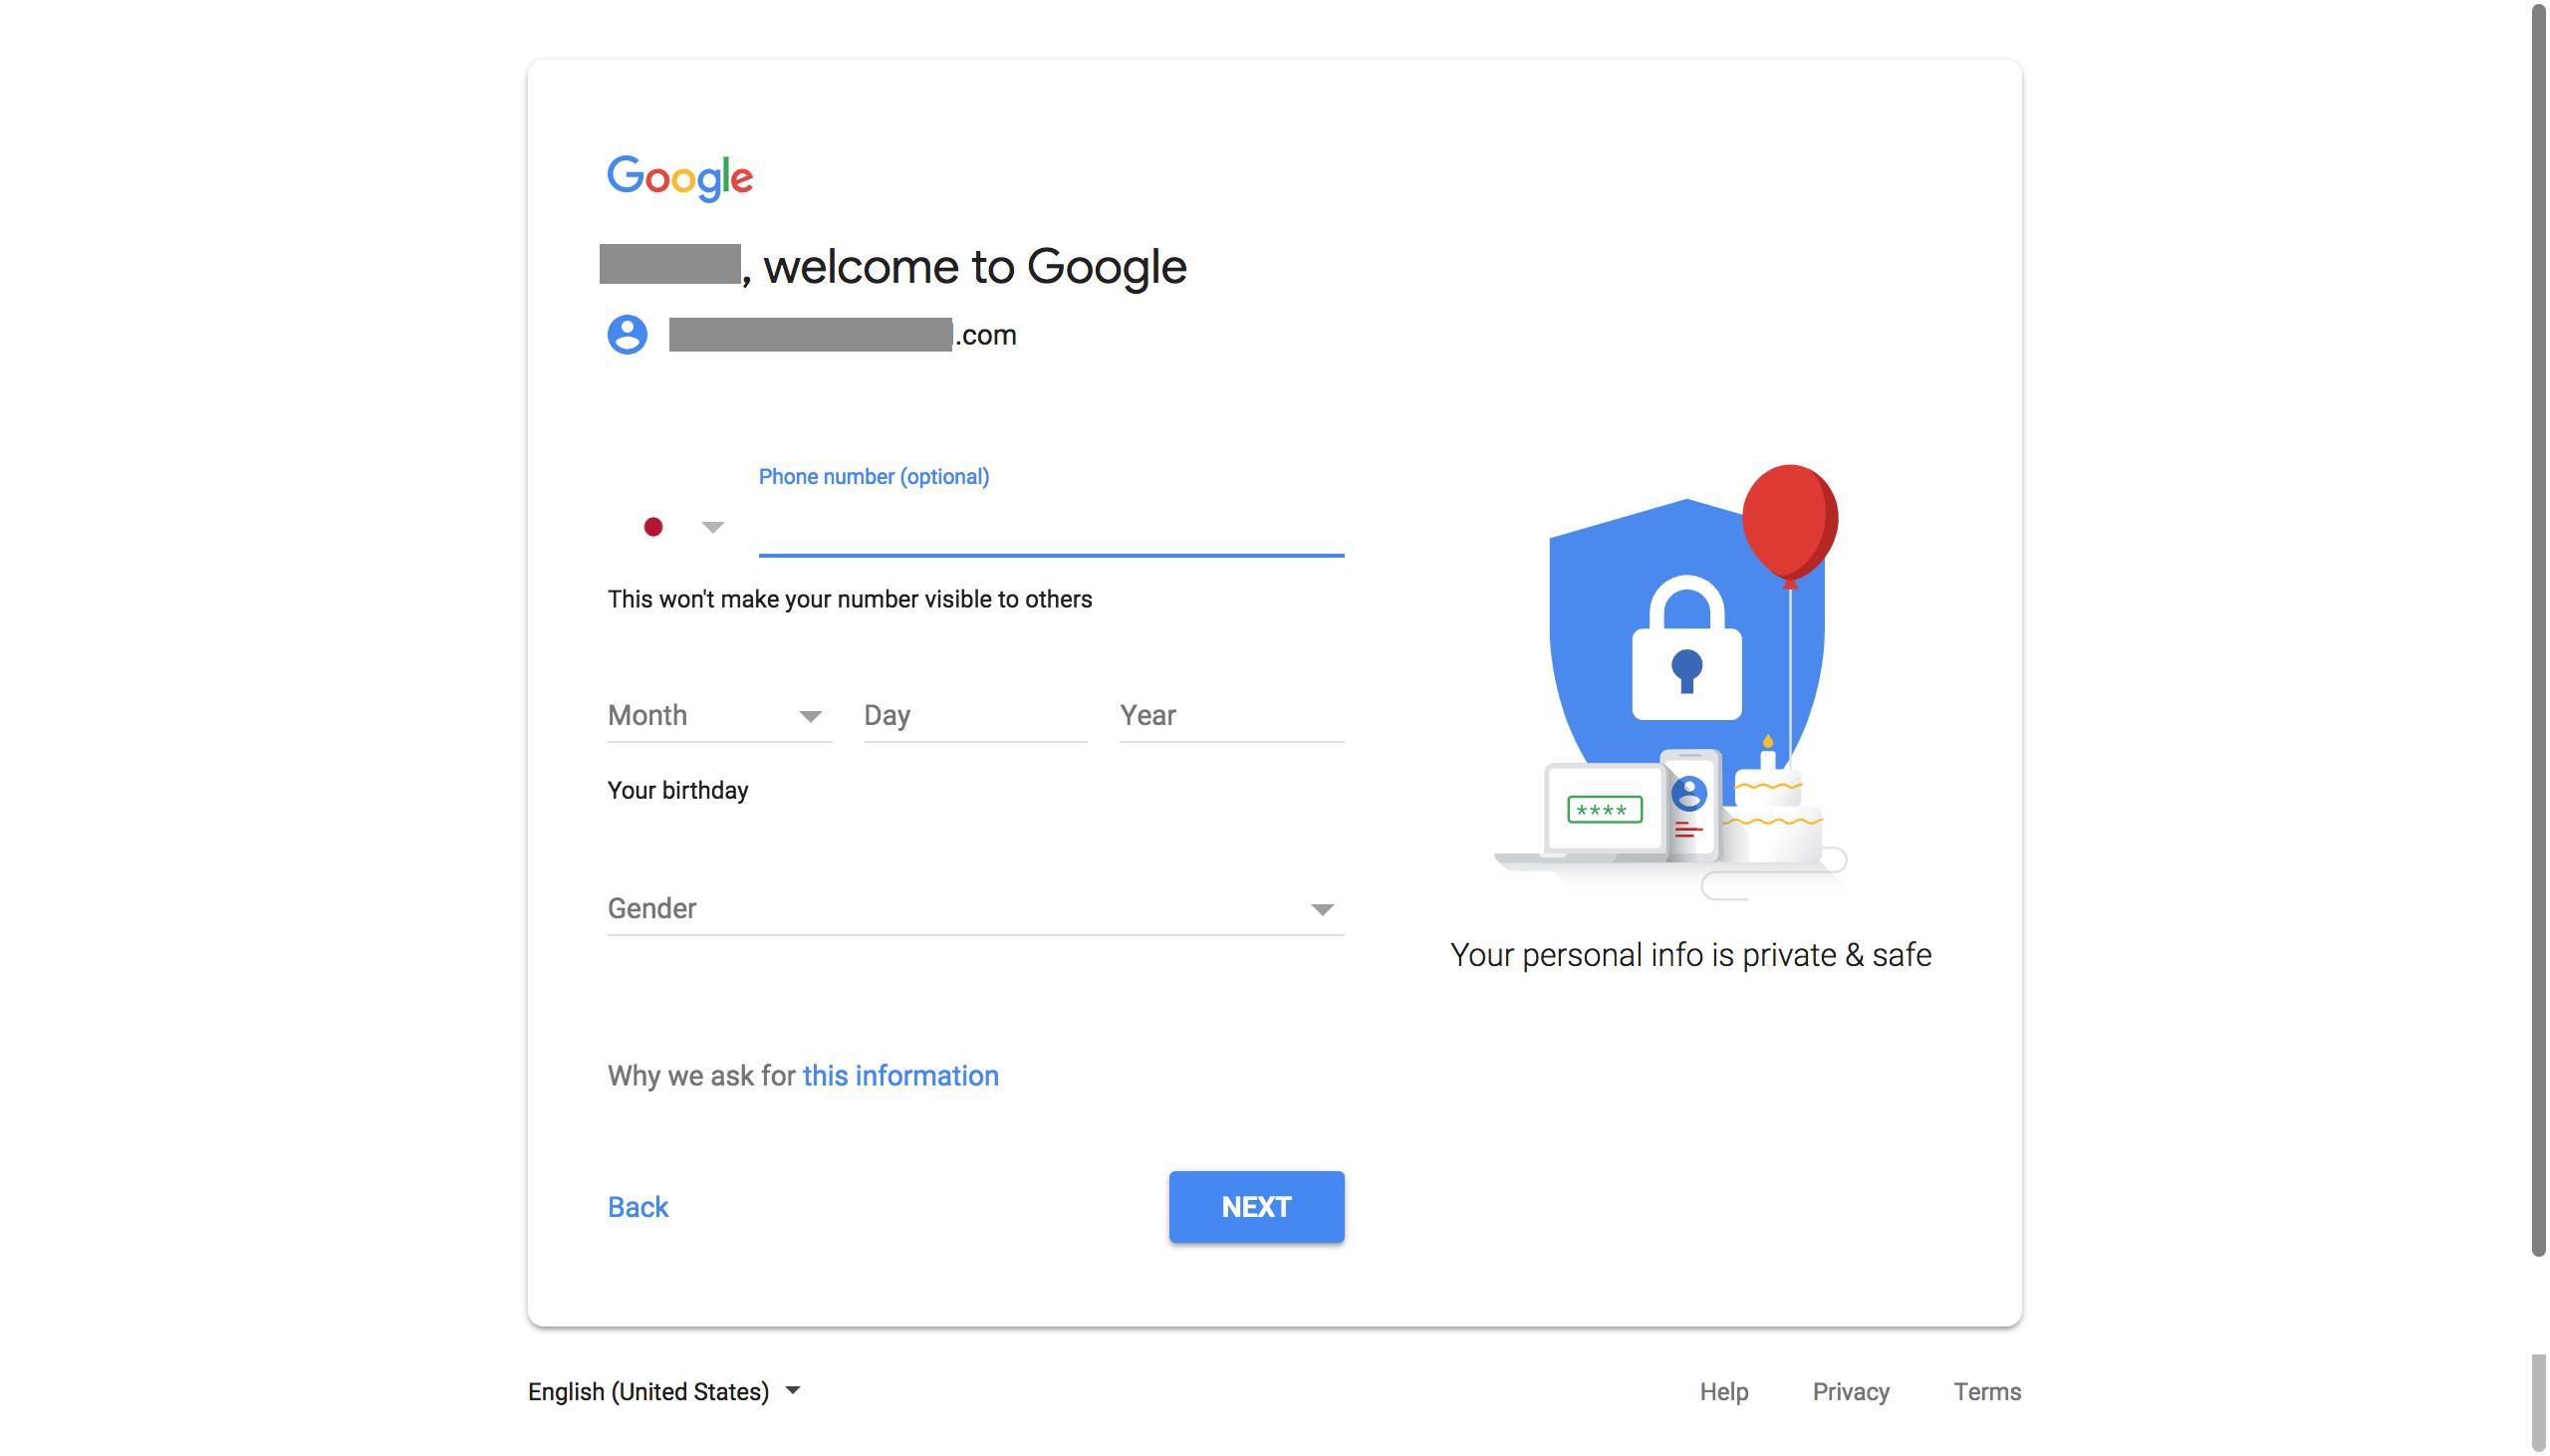 Google account welcome screen